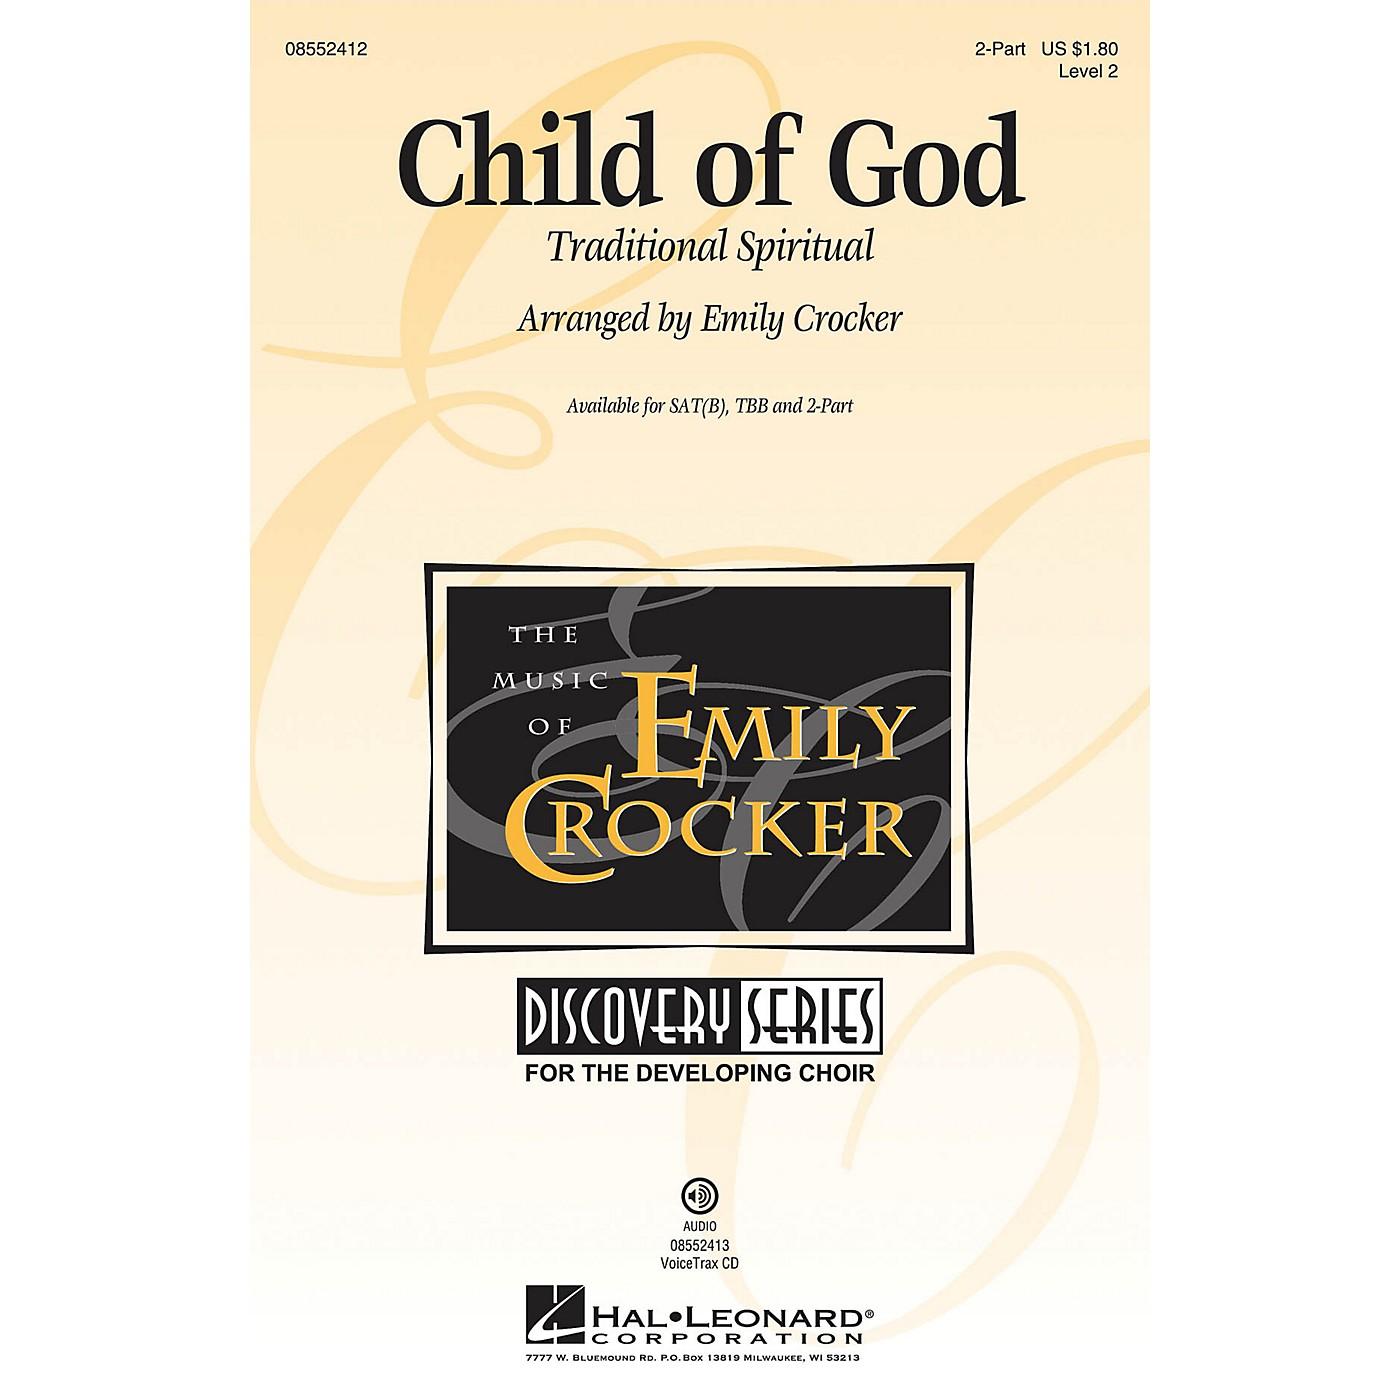 Hal Leonard Child of God (Discovery Level 2) 2-Part arranged by Emily Crocker thumbnail